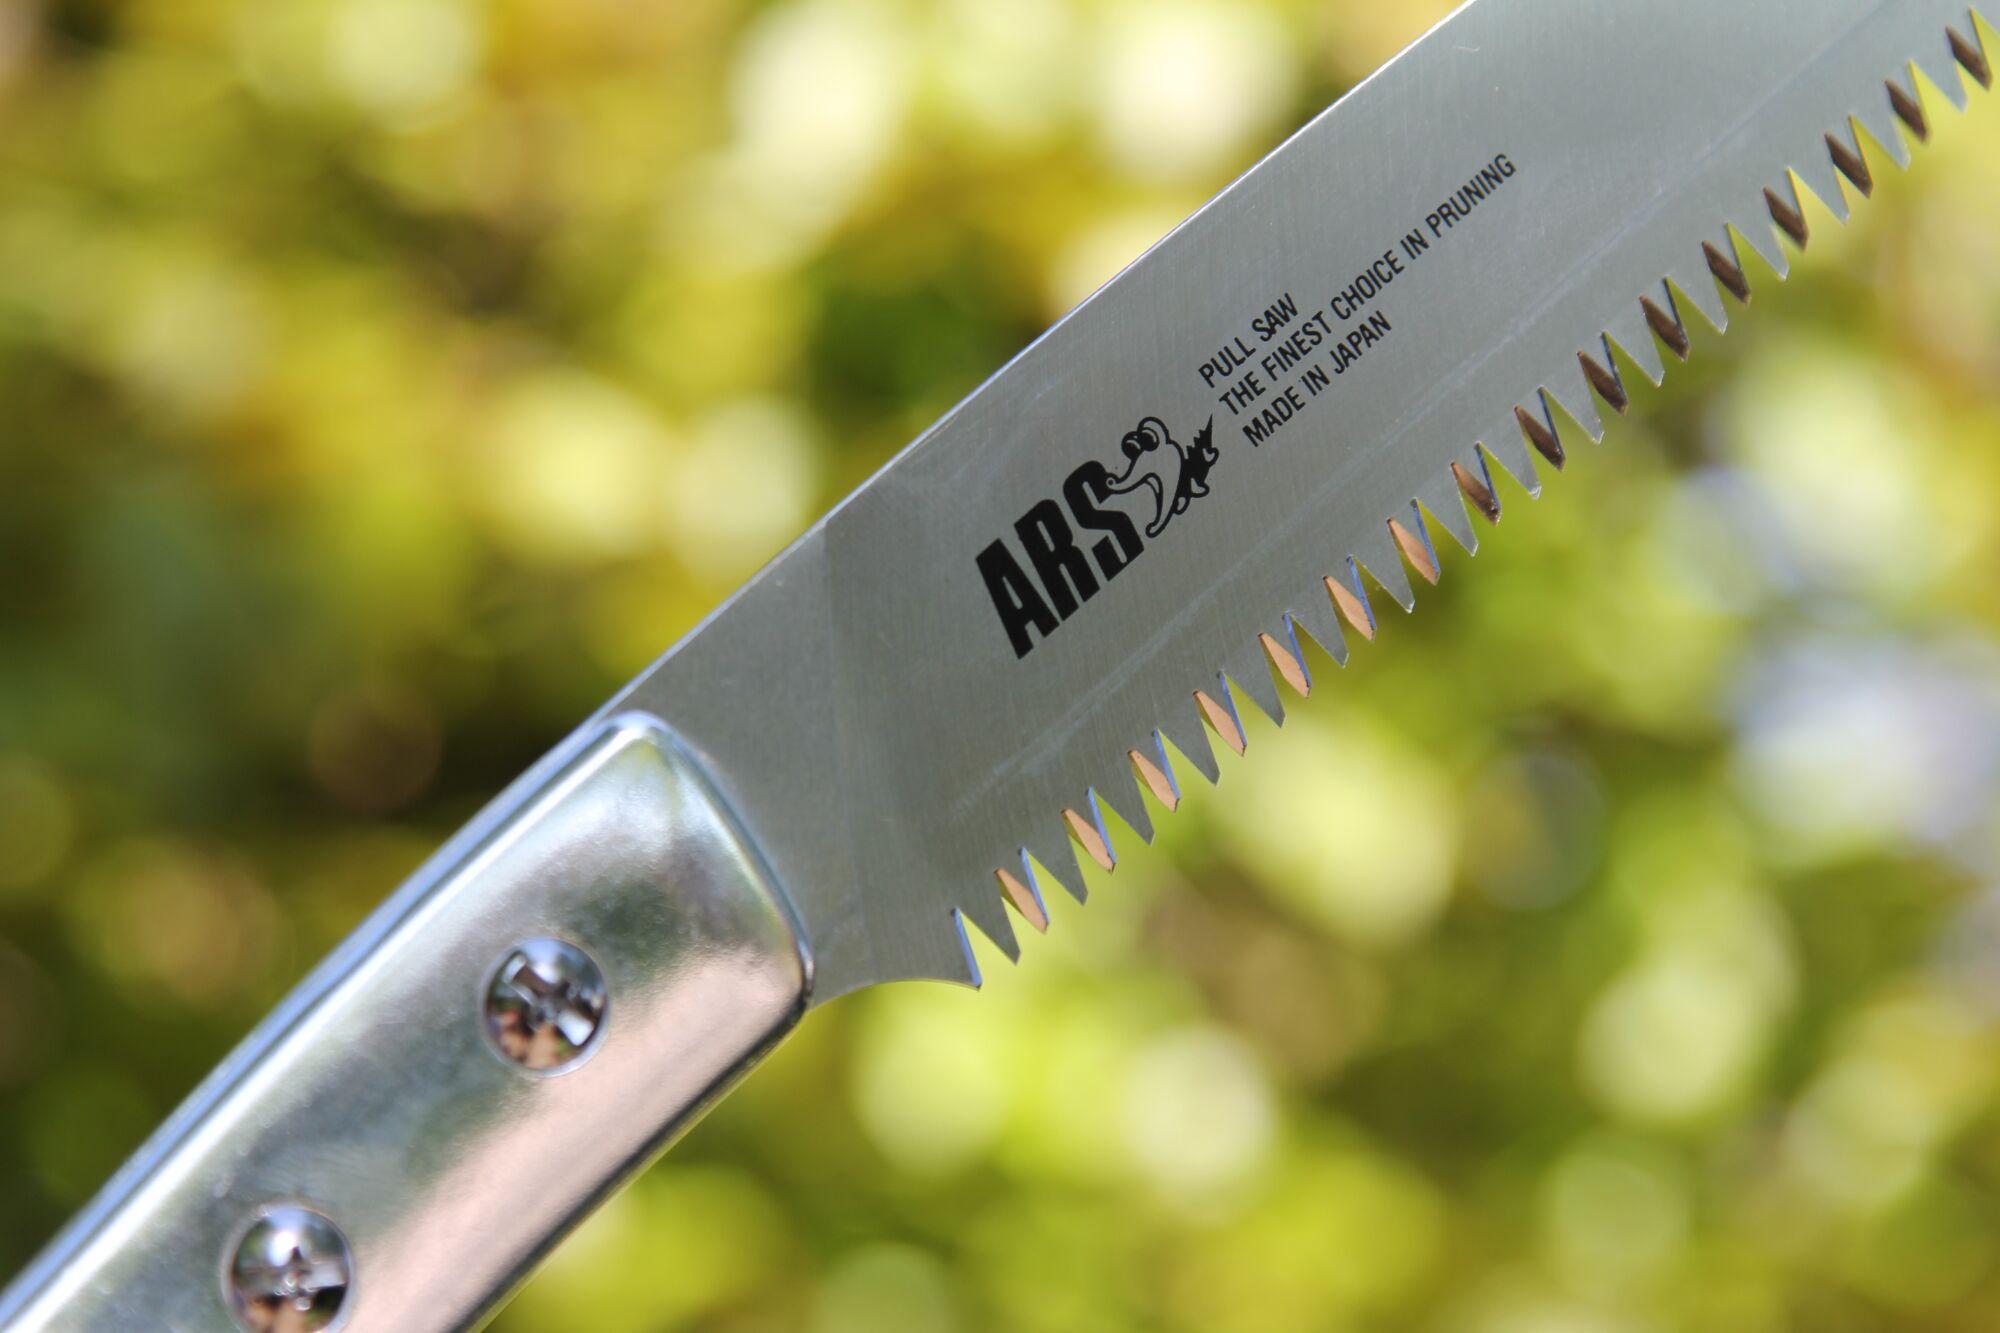 ARS ARSEXW-1.8